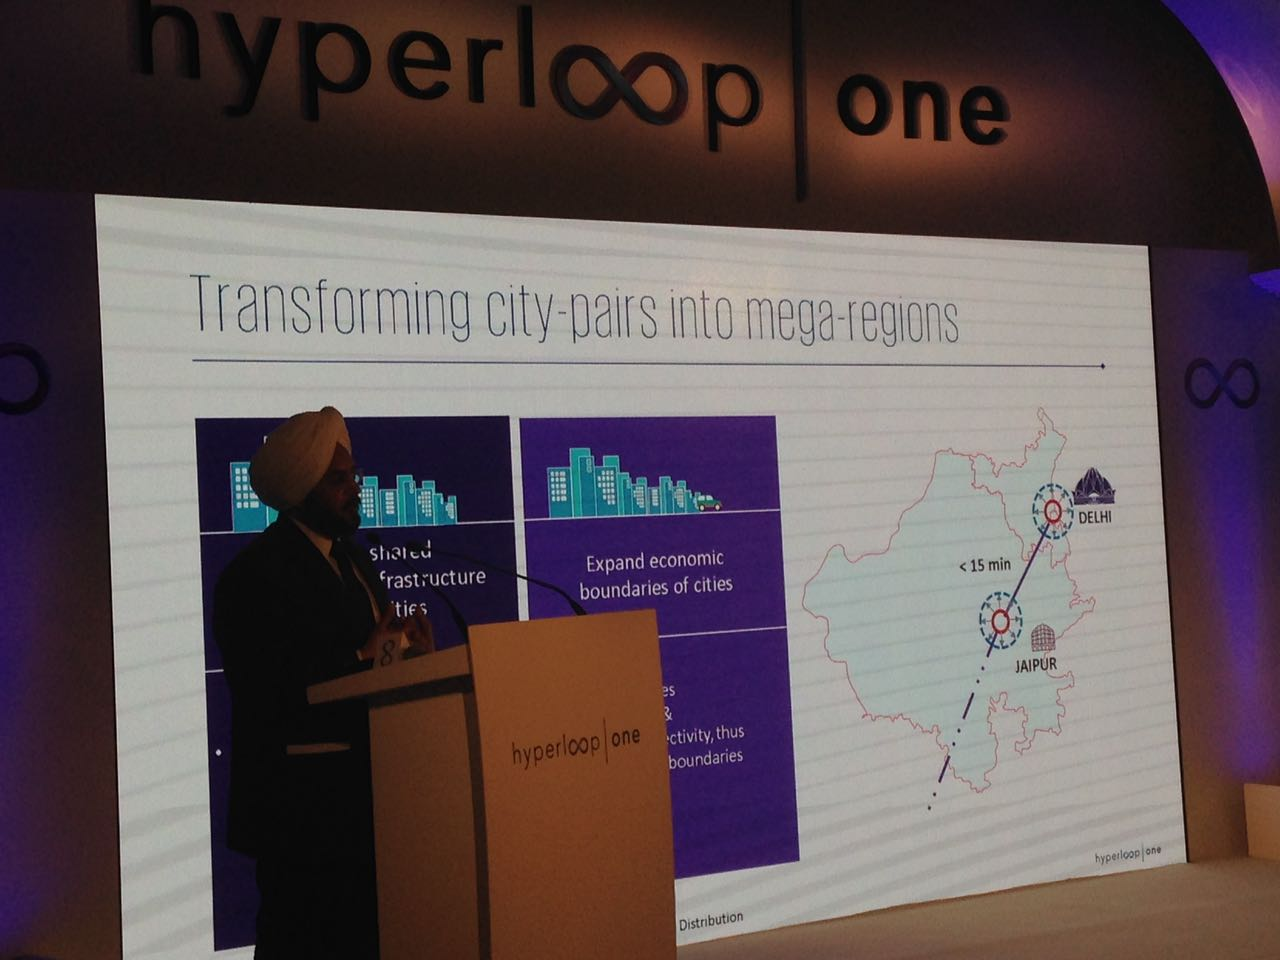 Hyperloop one India